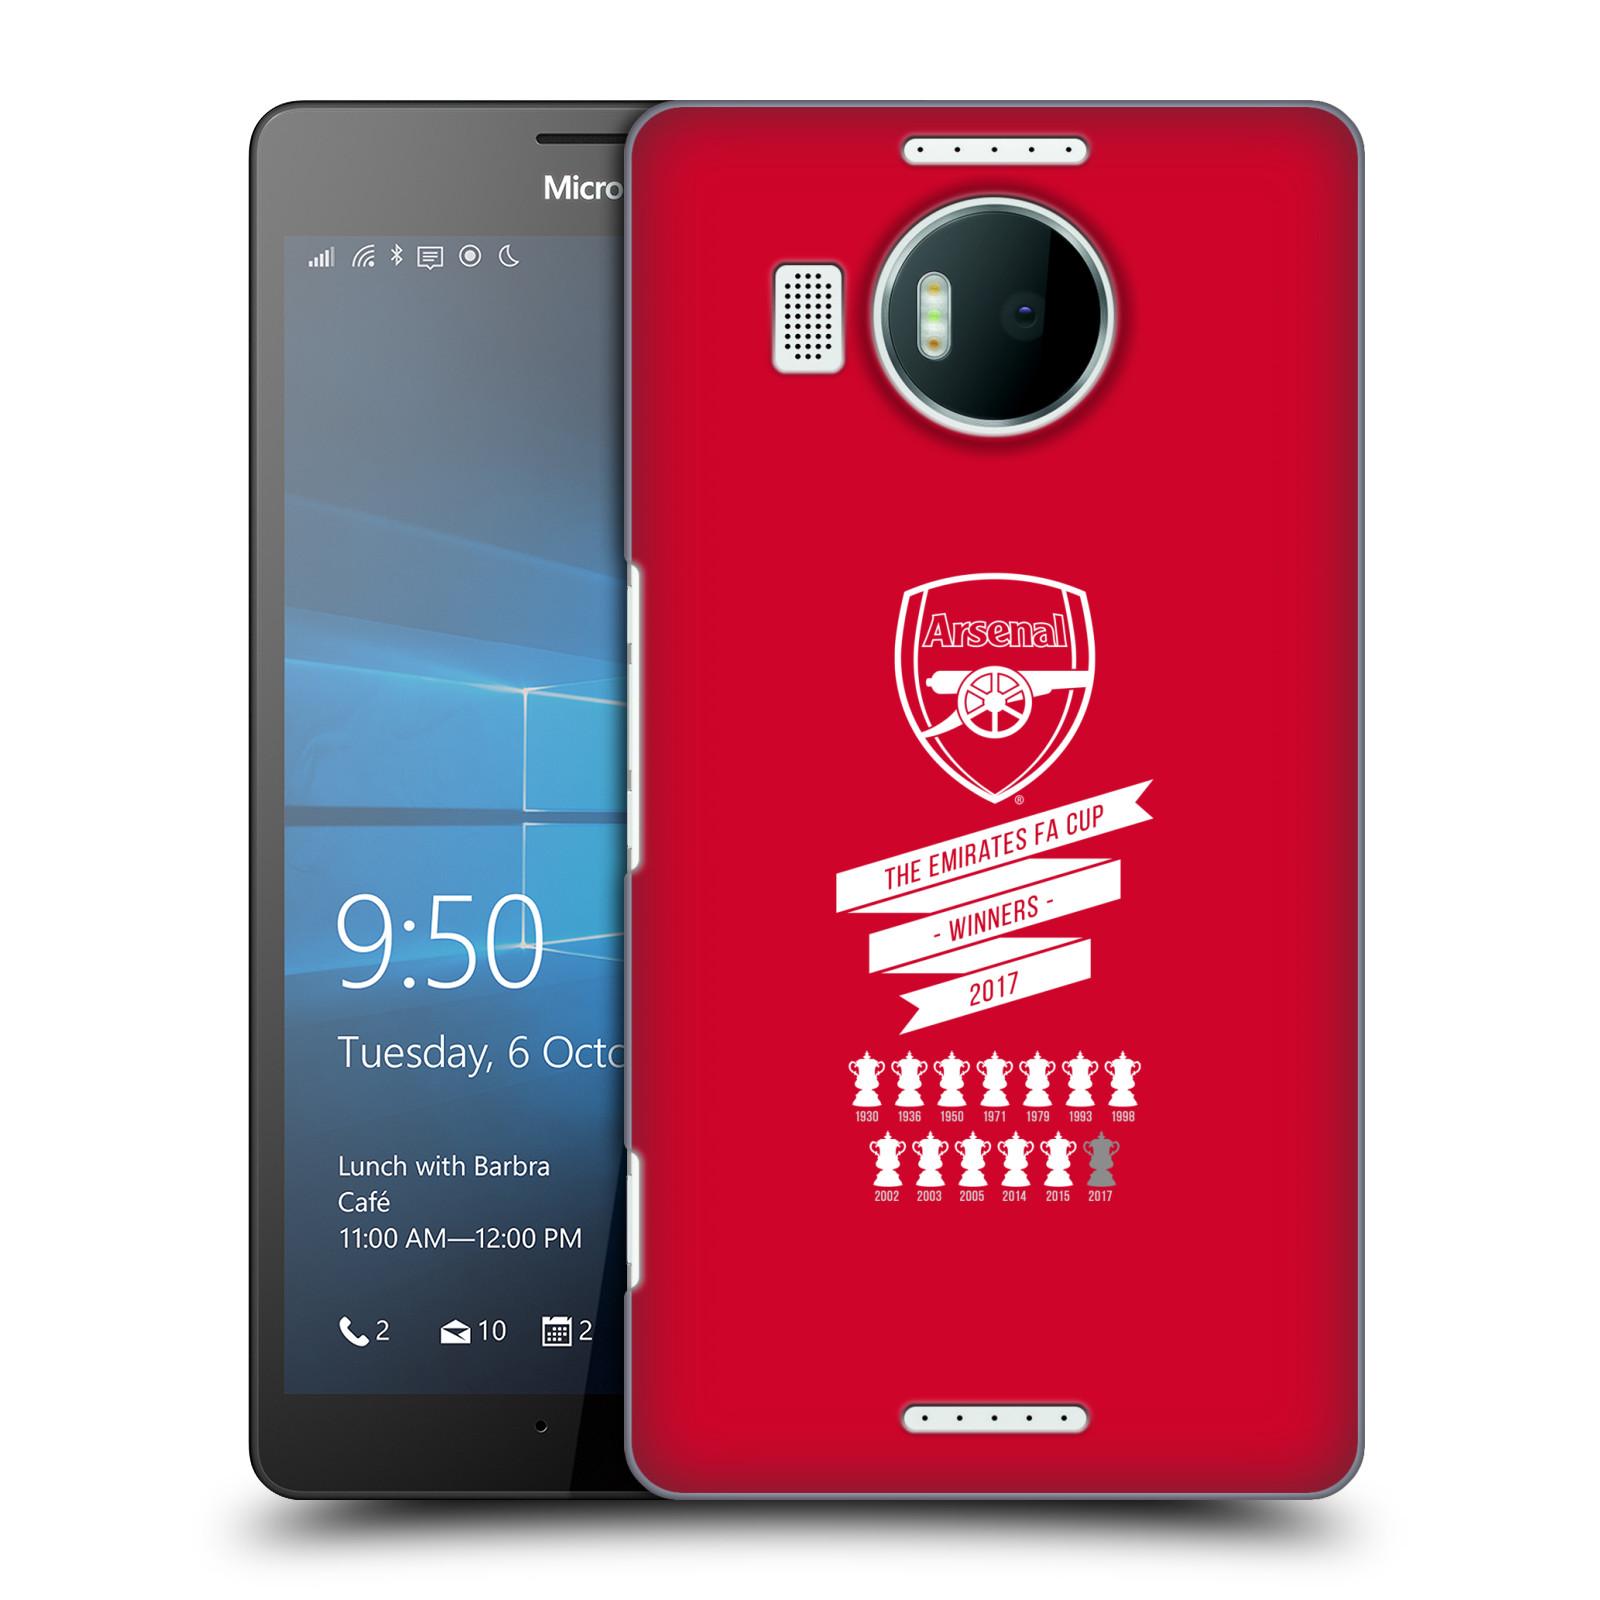 Plastové pouzdro na mobil Microsoft Lumia 950 XL - Head Case - Arsenal FC - 13 Wins